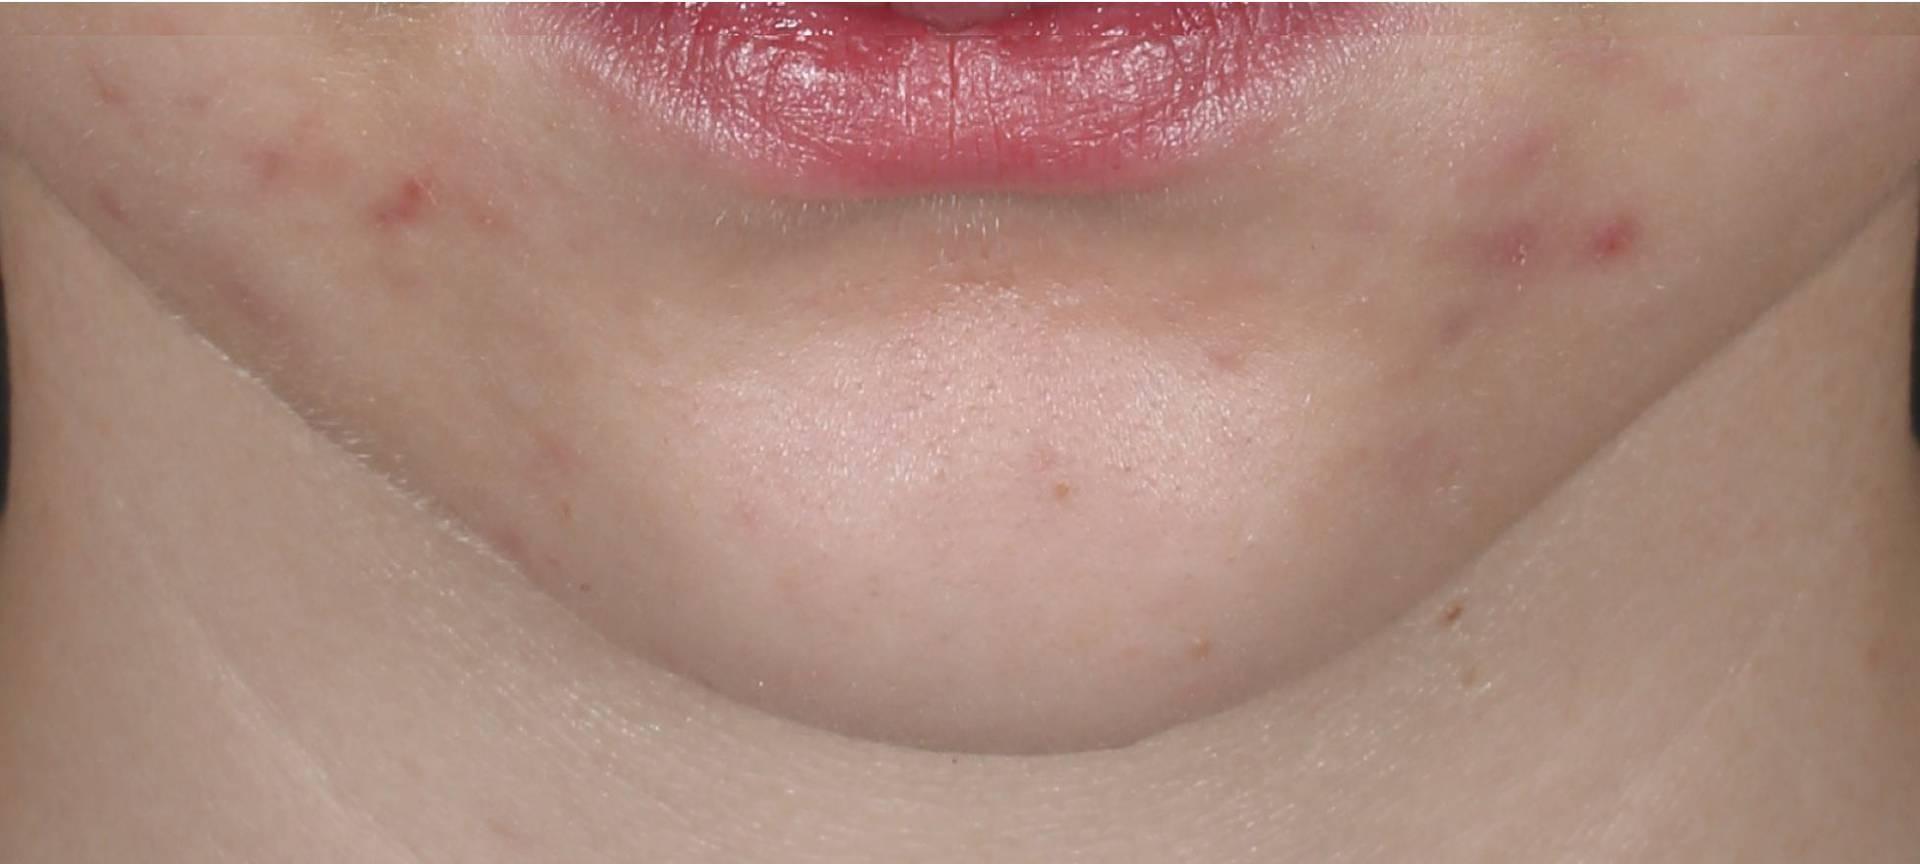 Science Backed Dermatology before image